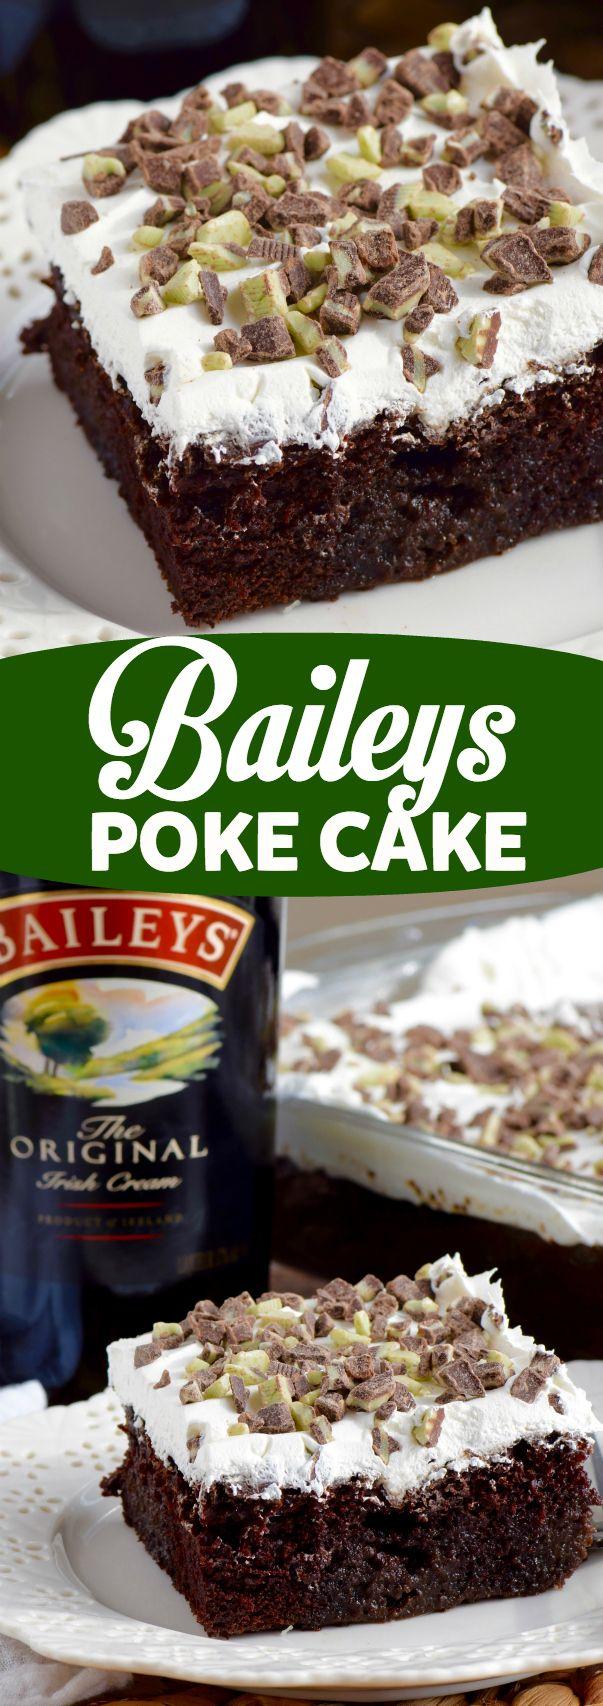 Baileys mint chocolate cake recipe